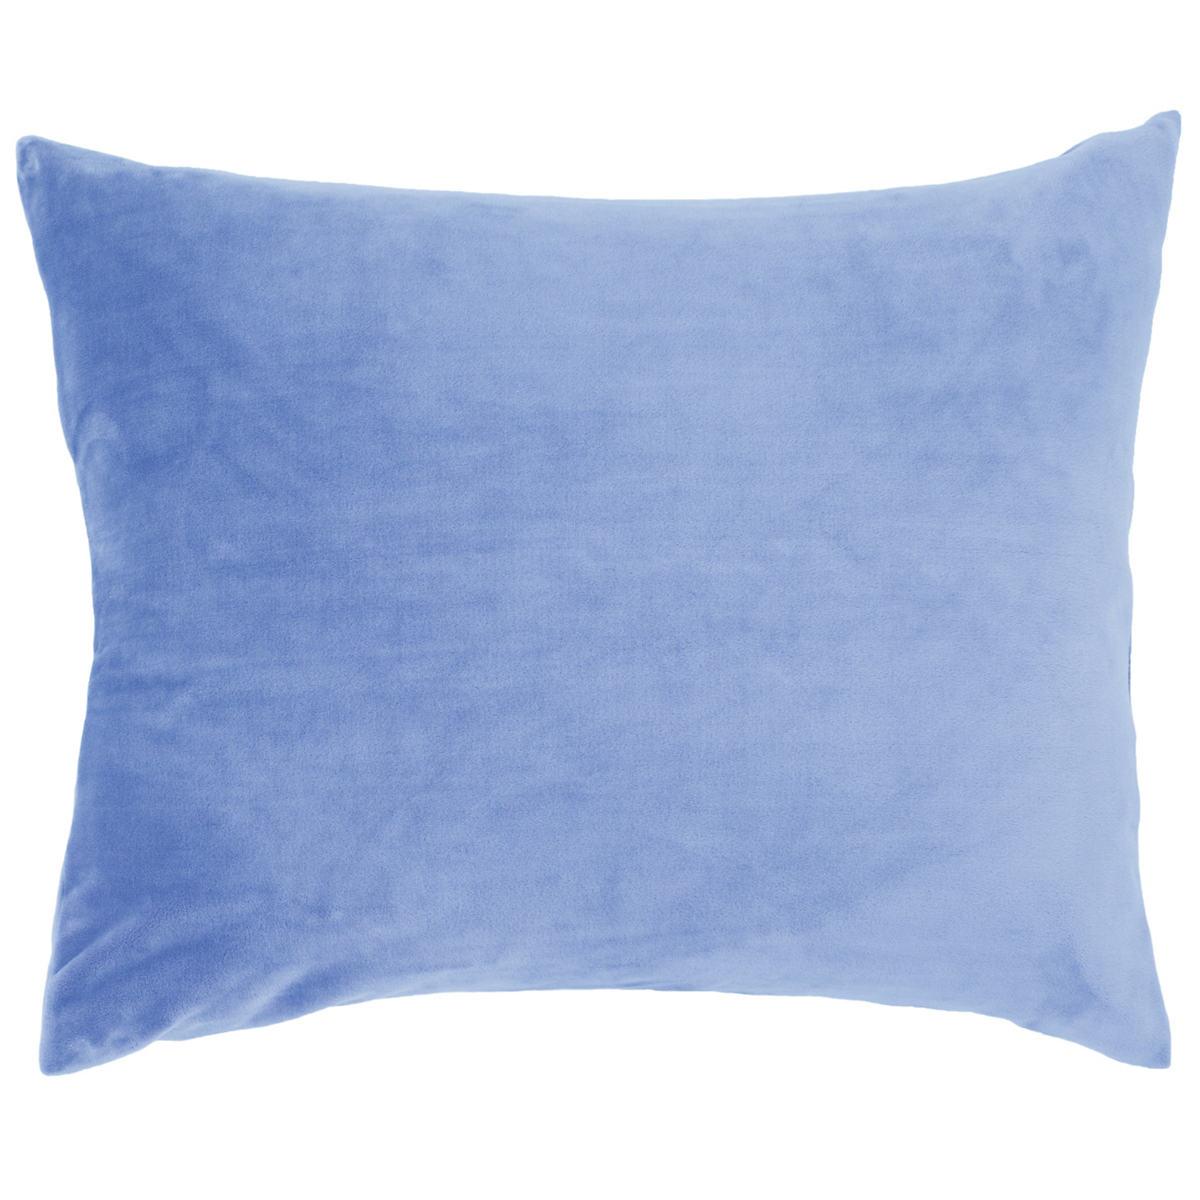 Selke Fleece French Blue Decorative Pillow